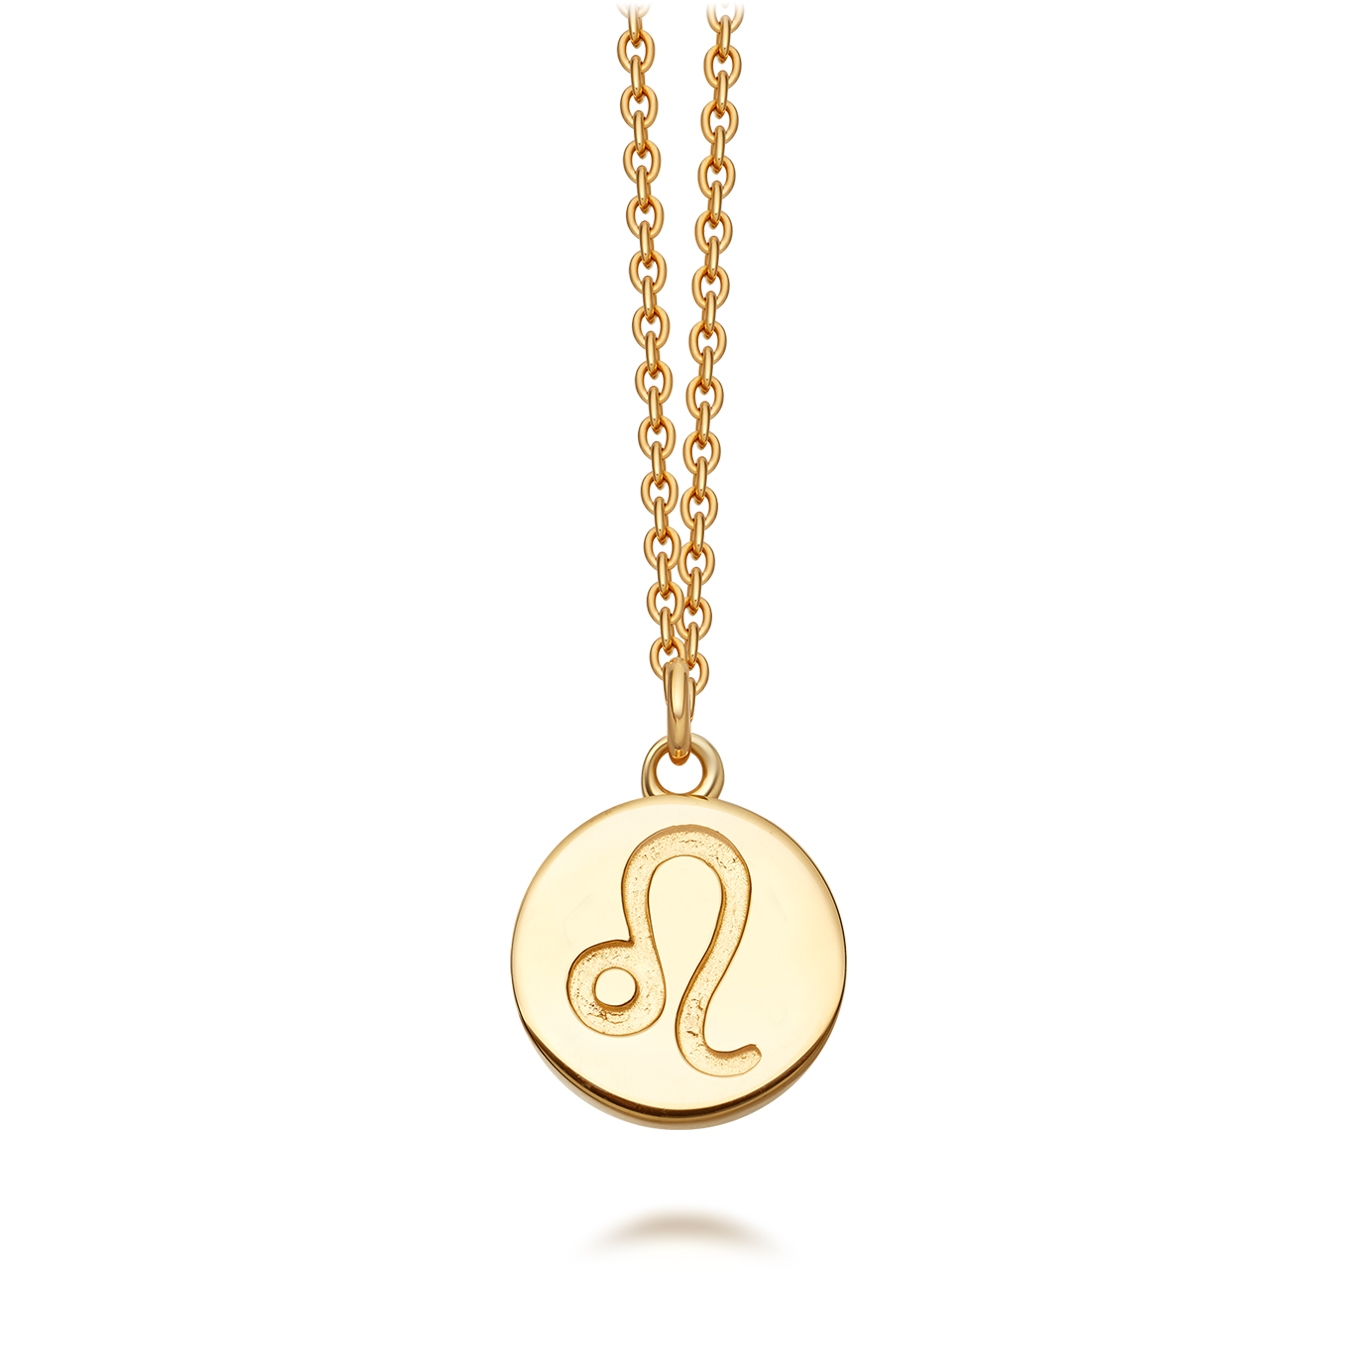 Gold Leo Zodiac Biography Pendant Necklace